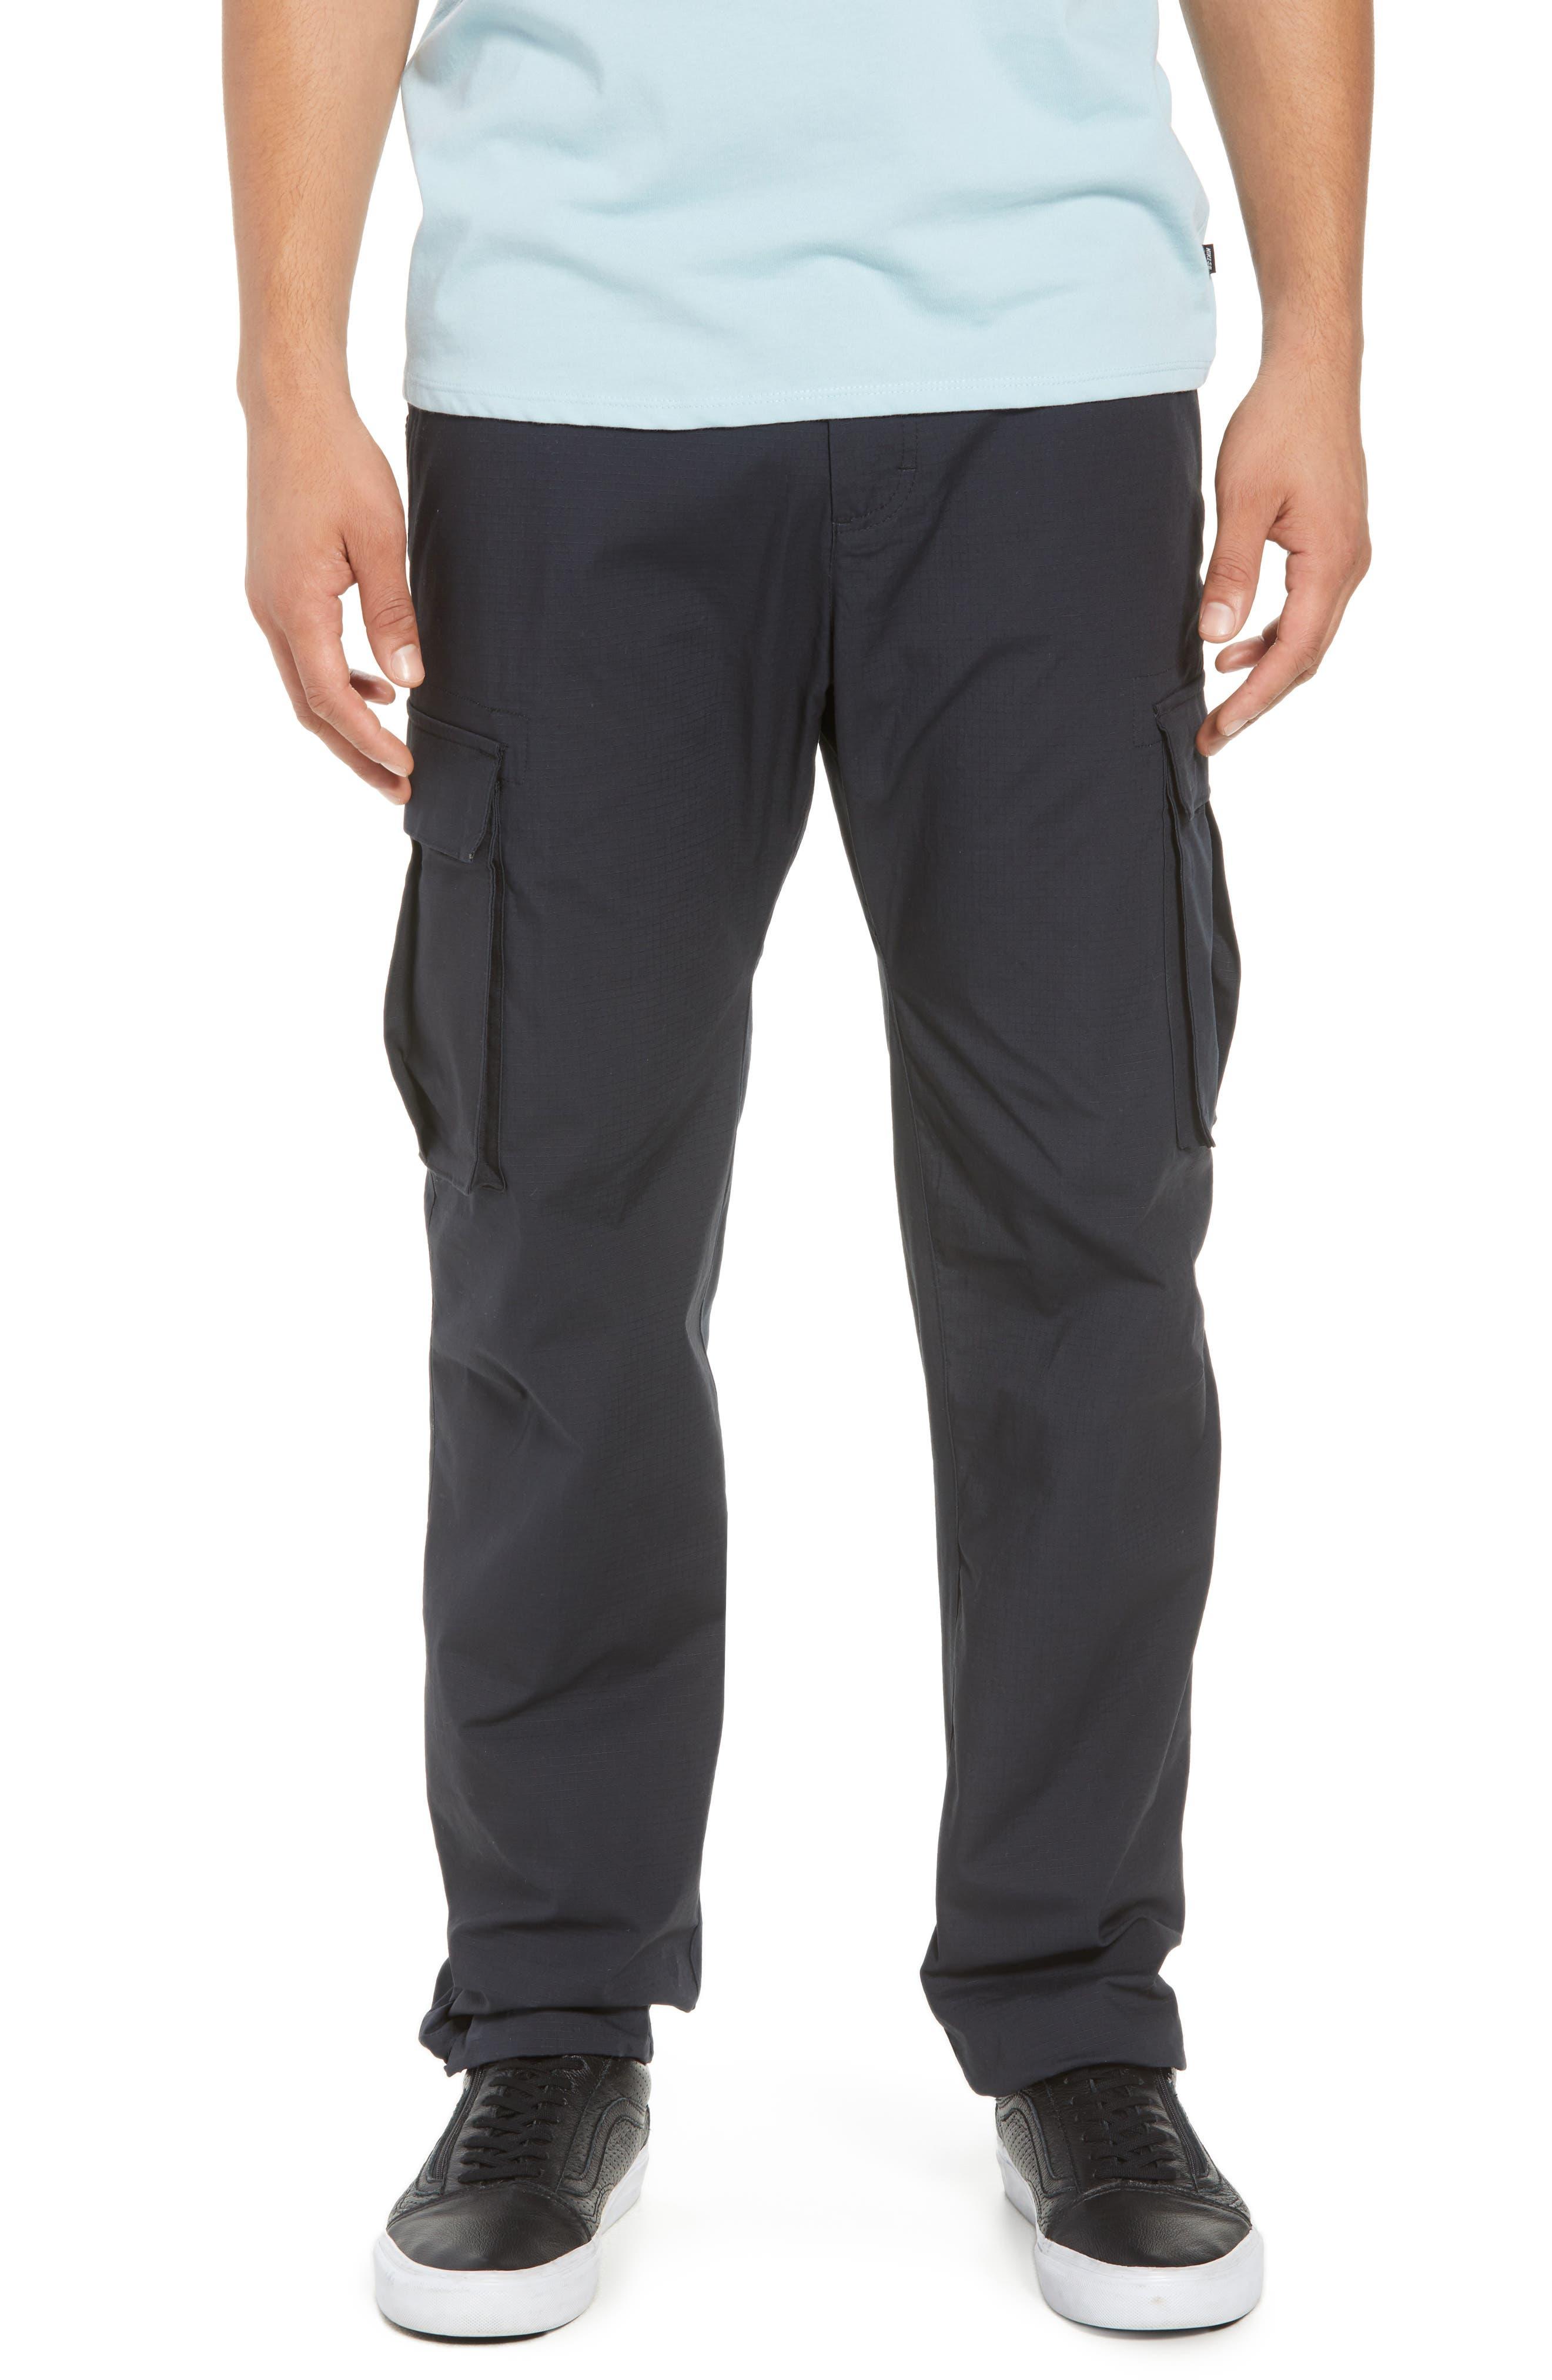 NIKE SB, Flex Cargo Pants, Main thumbnail 1, color, BLACK